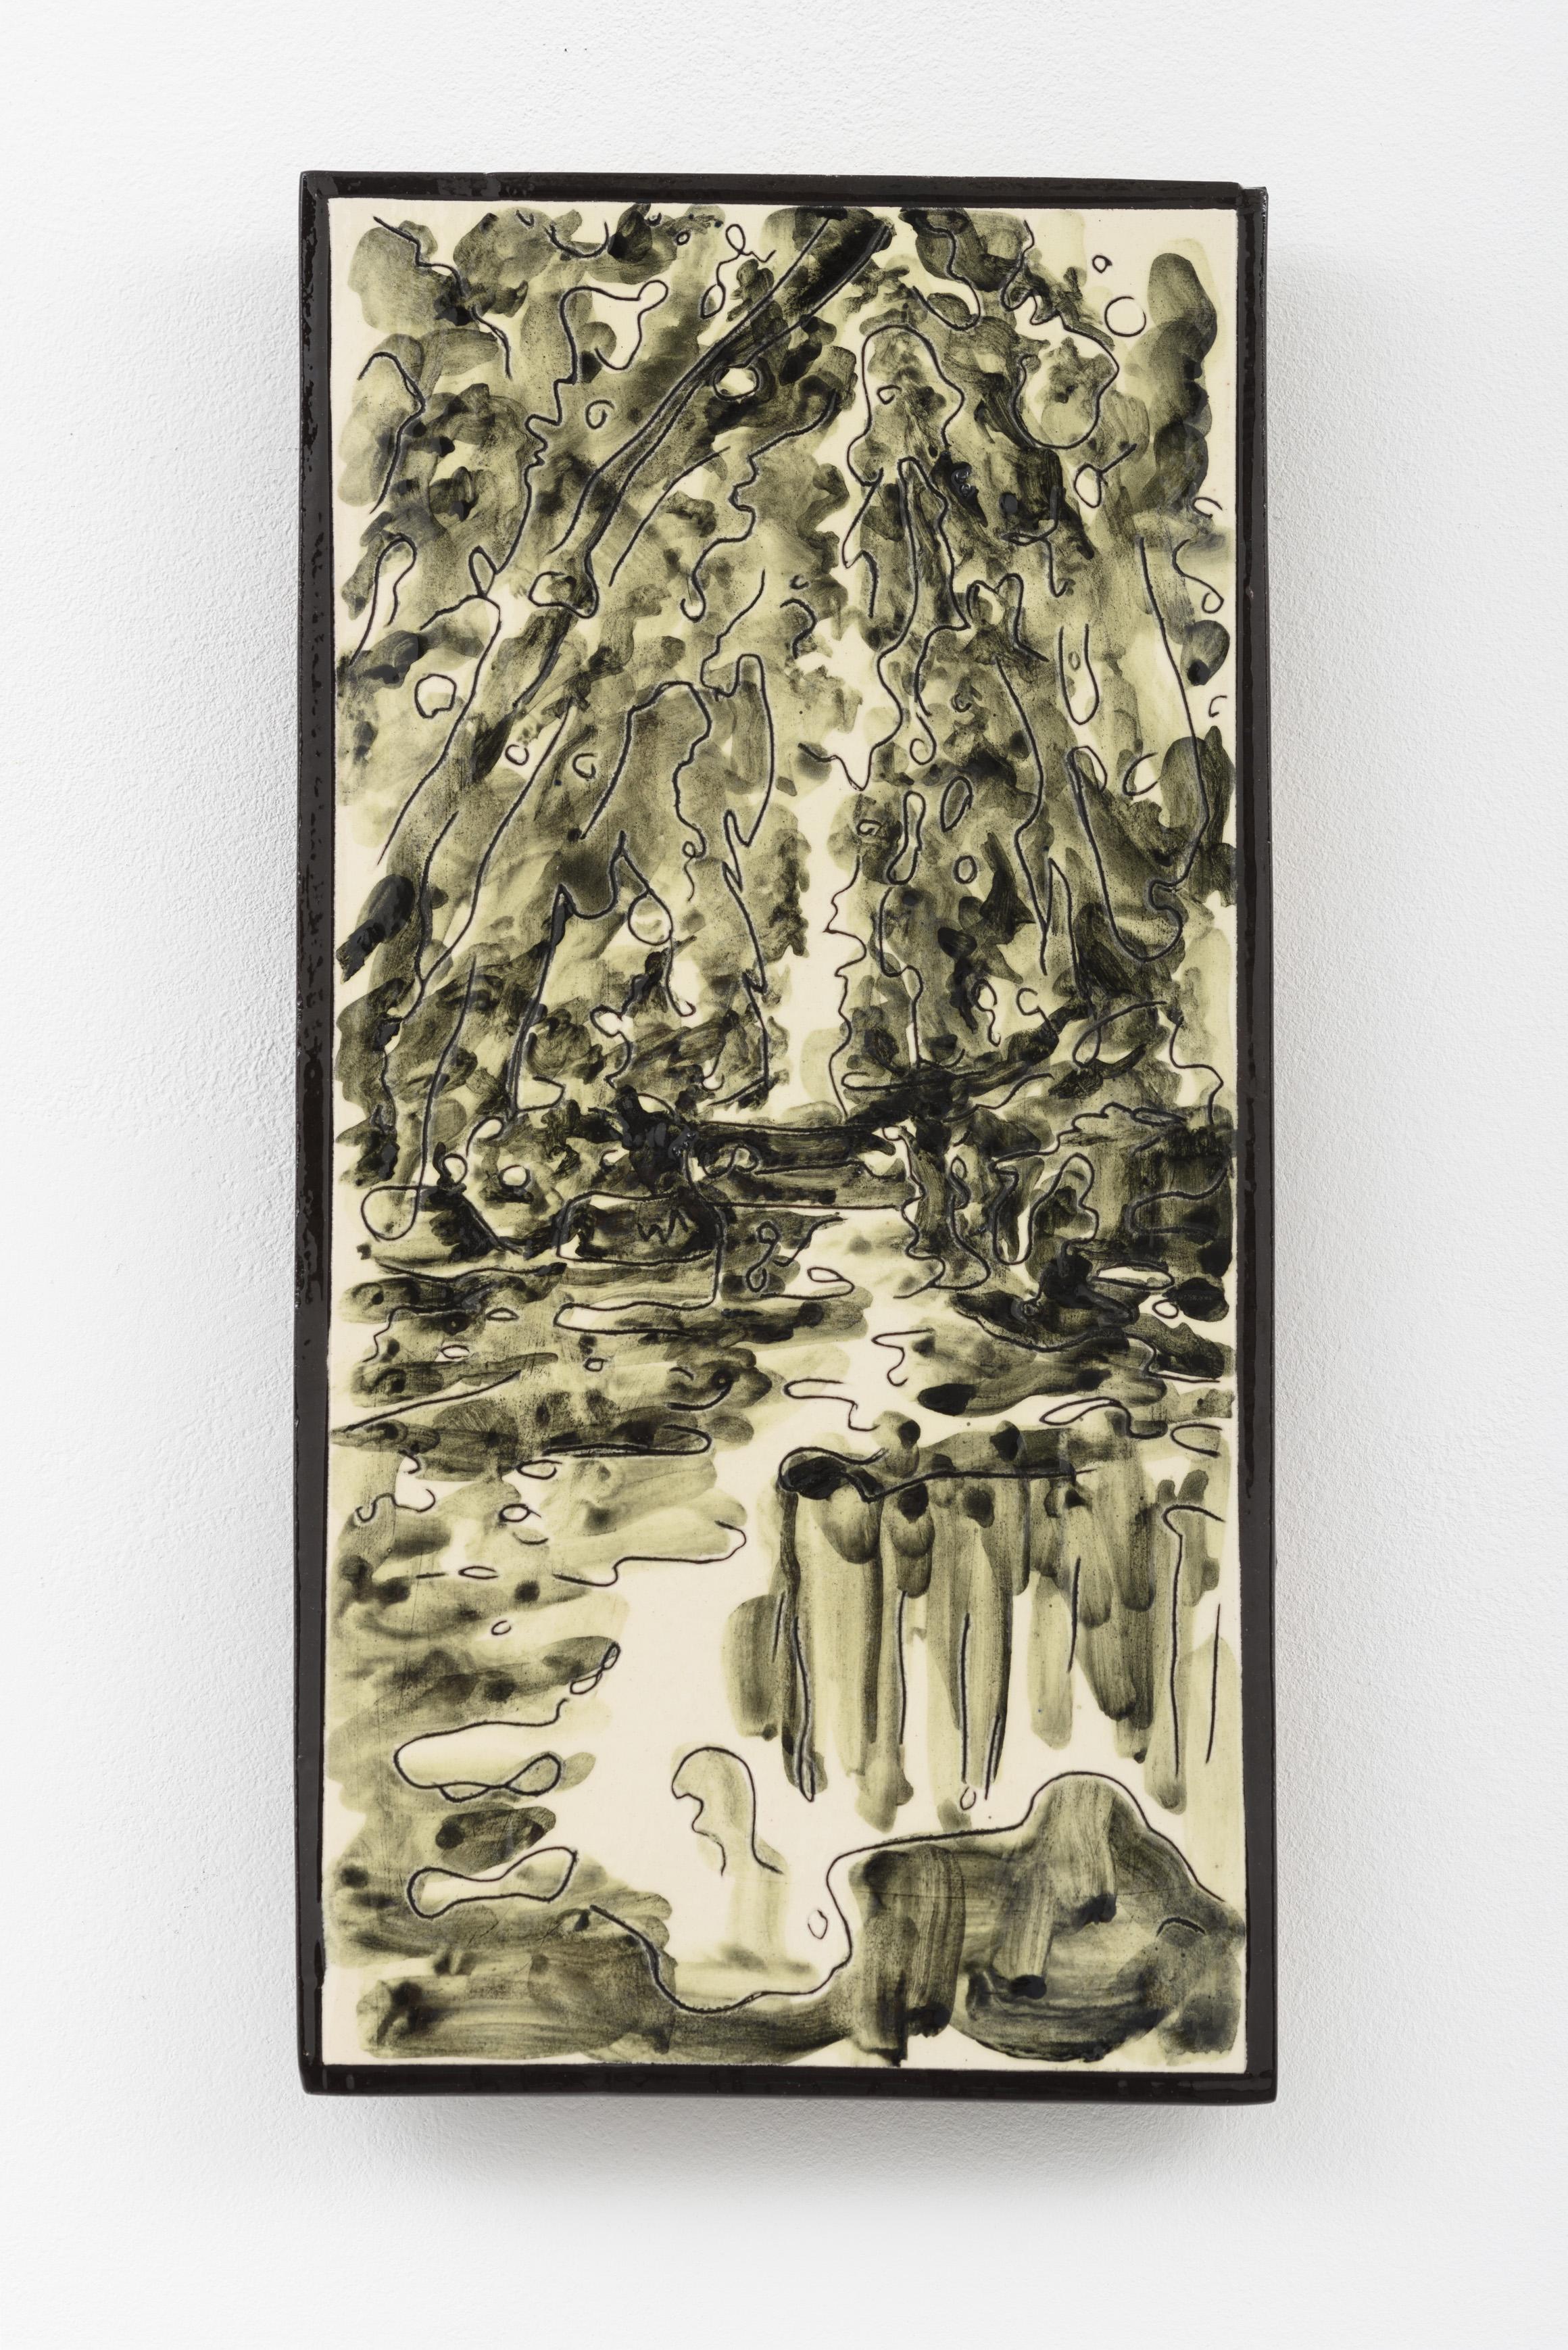 """O meu Alentejo IV"", painted ceramic tile, 29,1 x 14,8 cm., Portugal 2015"